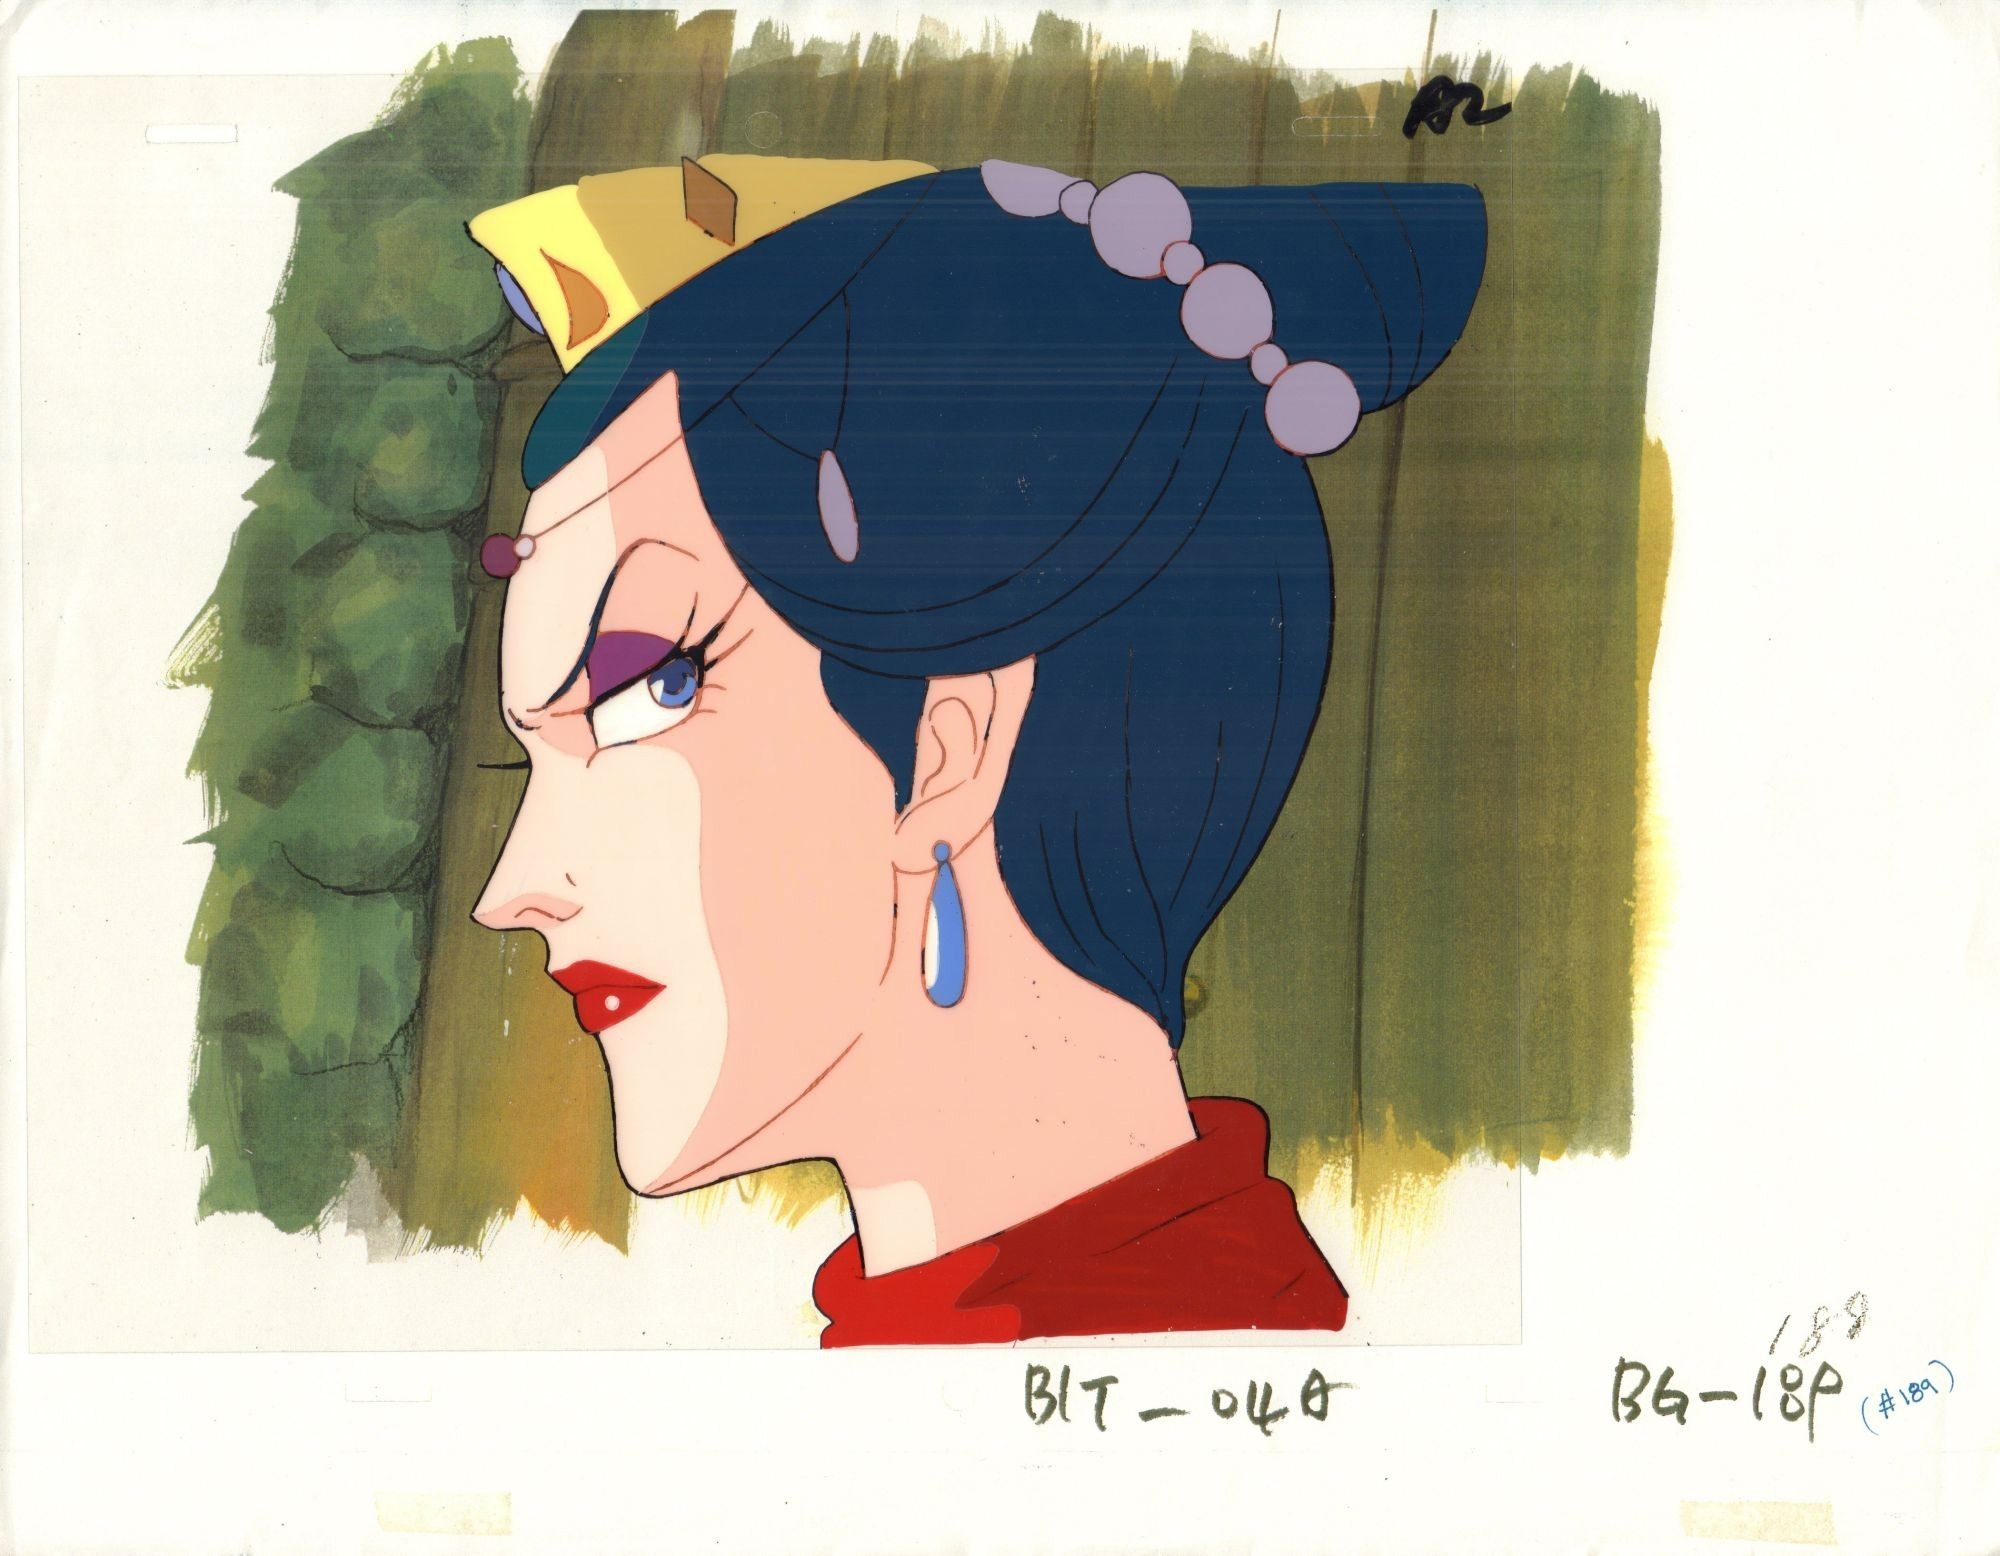 The Legend of Princess Snow White, BIT-04A